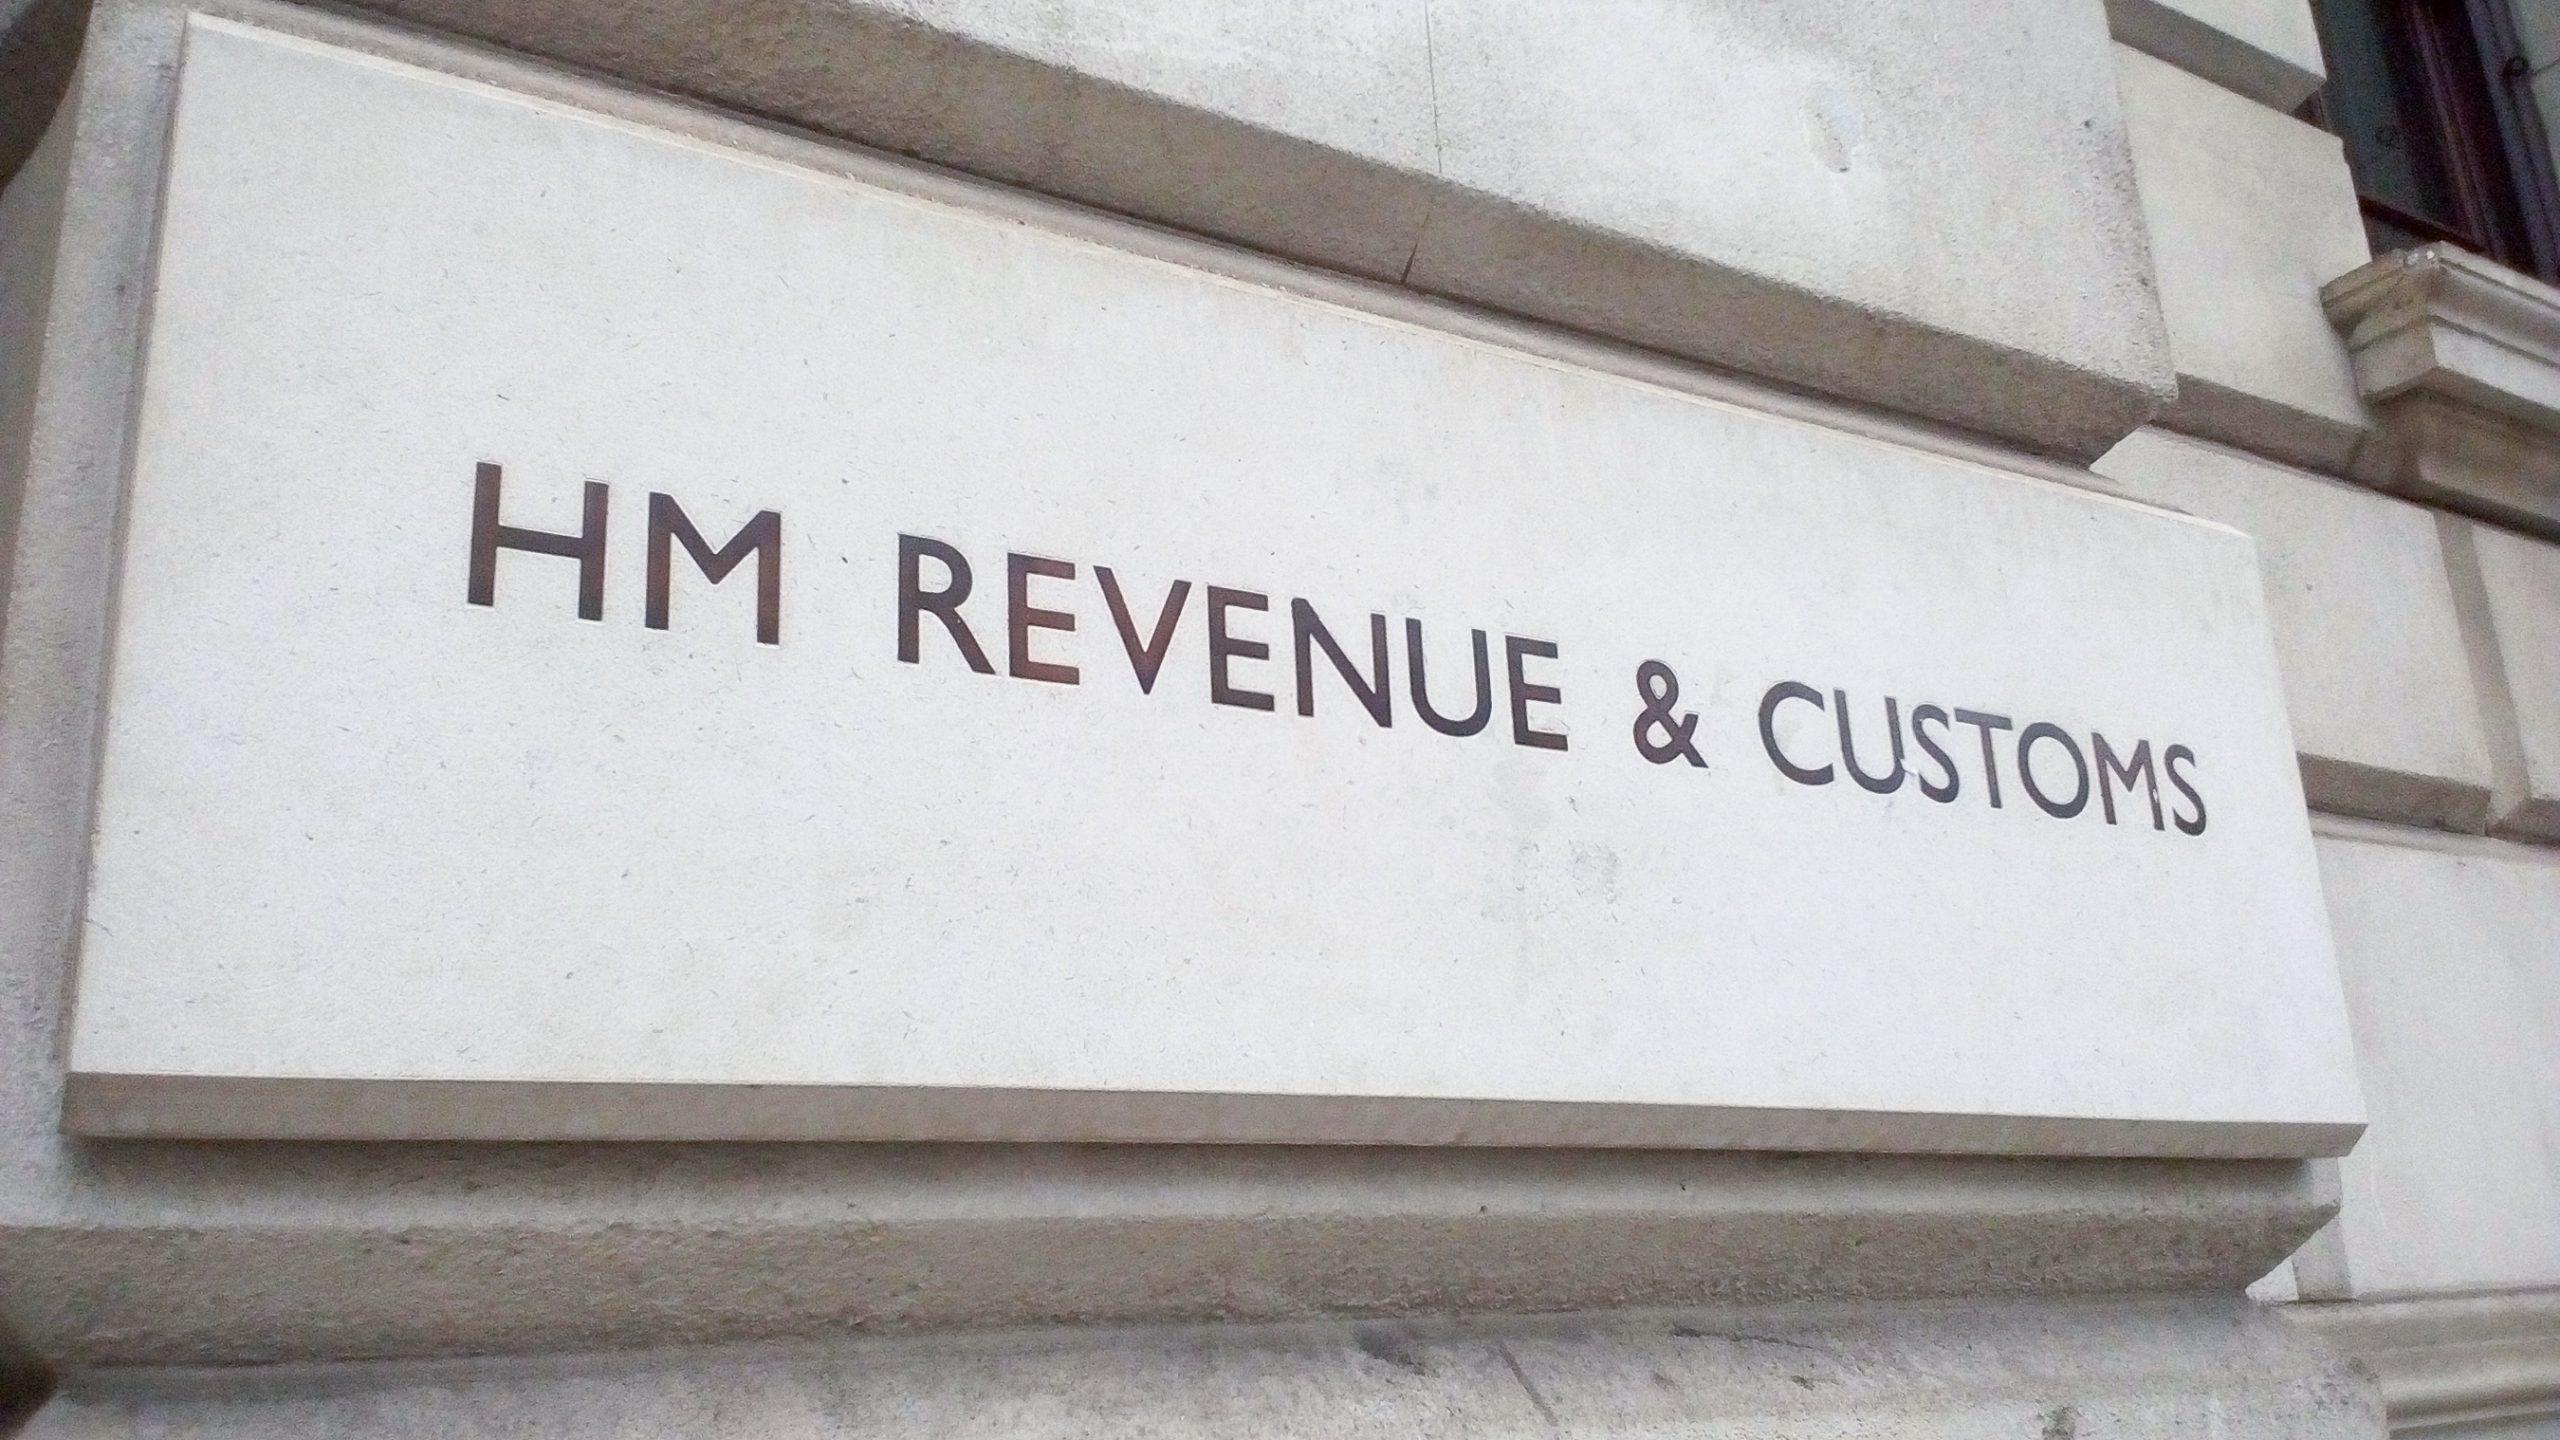 HMRC to enforce IR35 rules